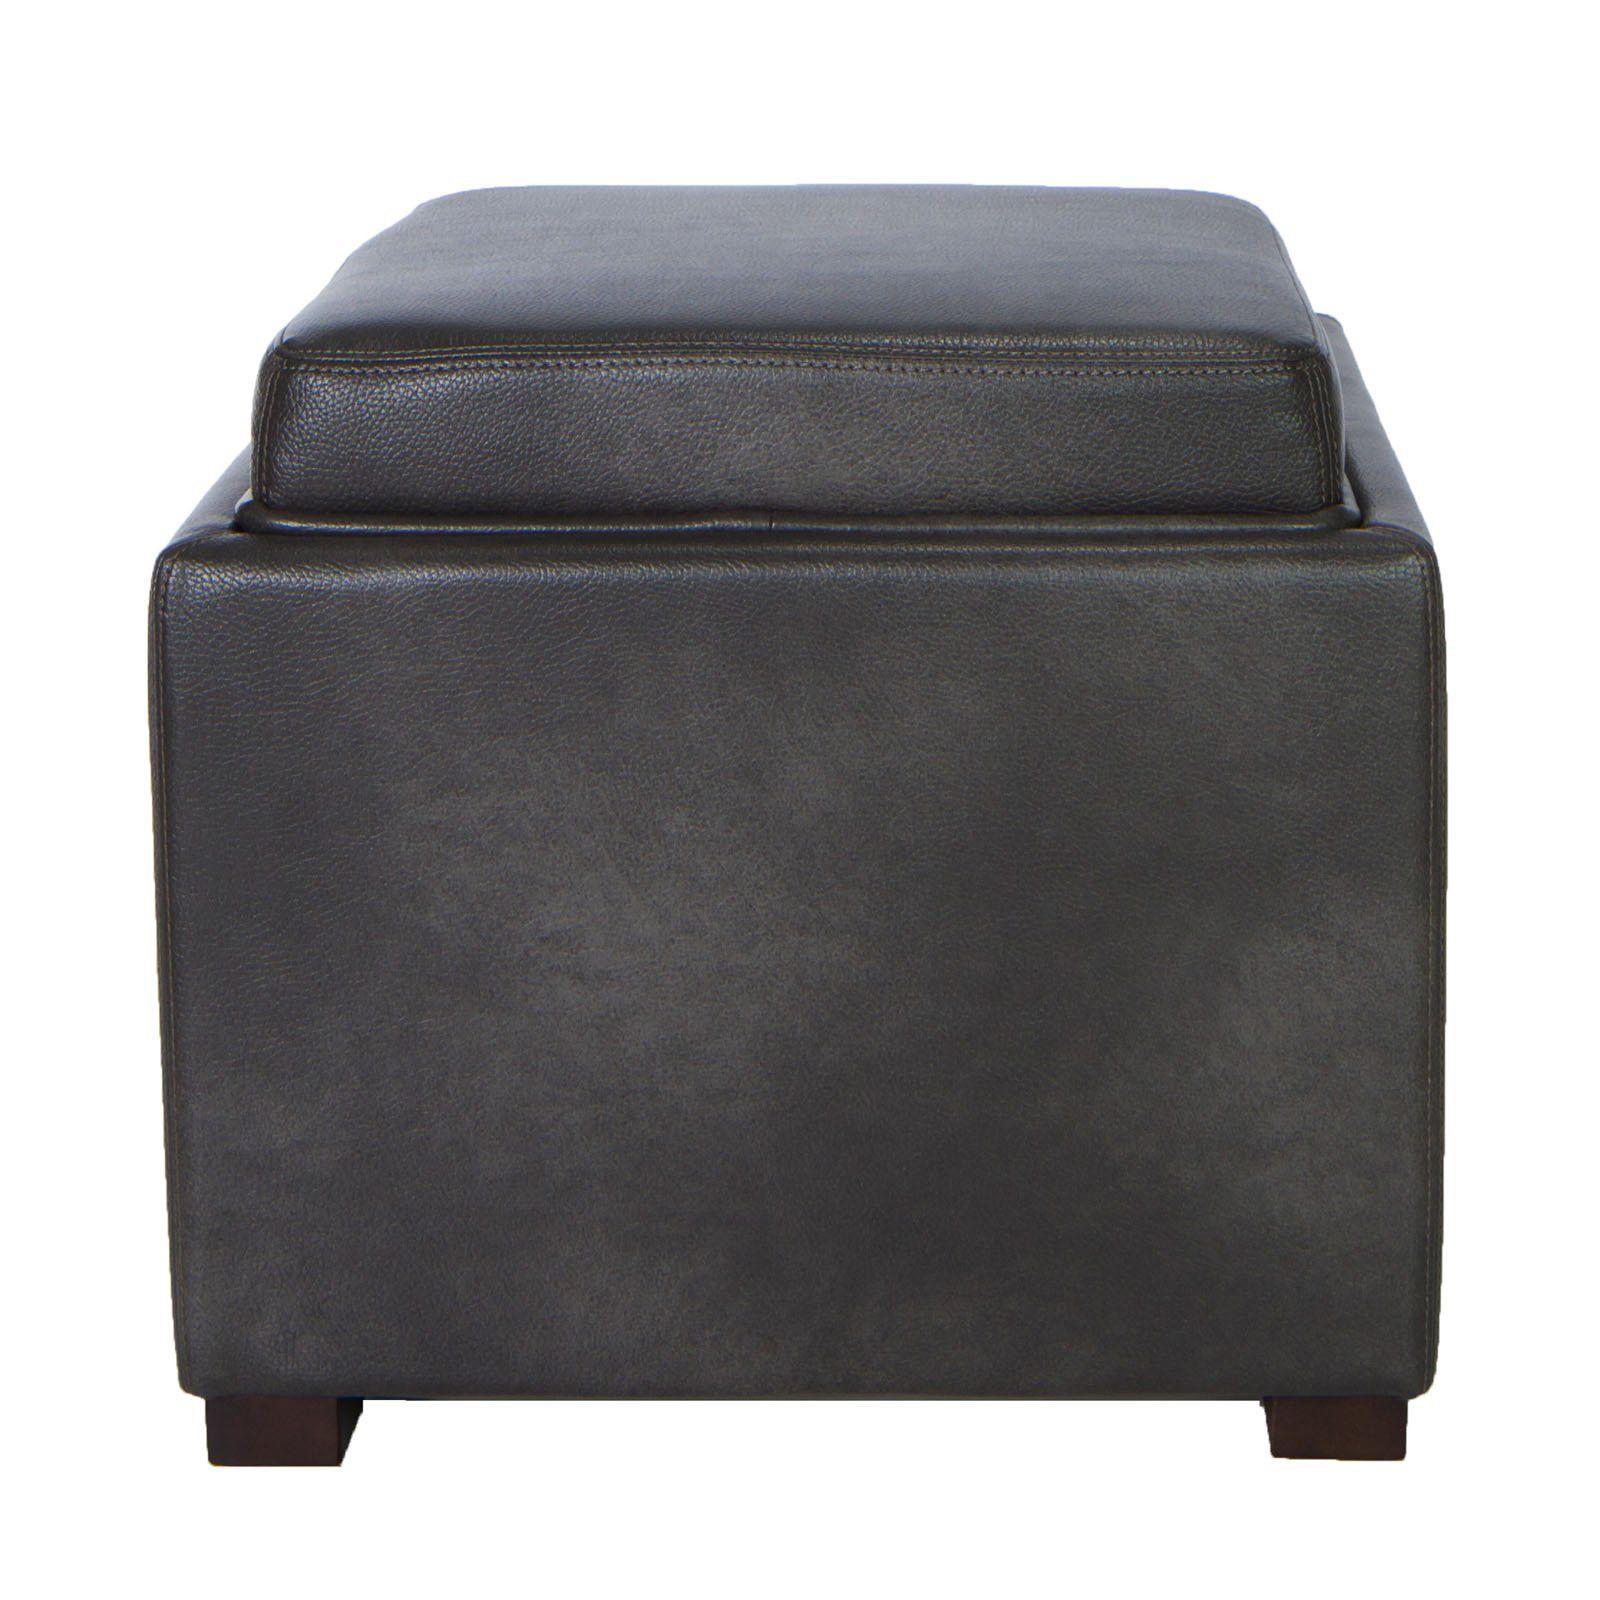 Cortesi Home Mavi Grey Top Tray Storage Cube Ottoman Storage